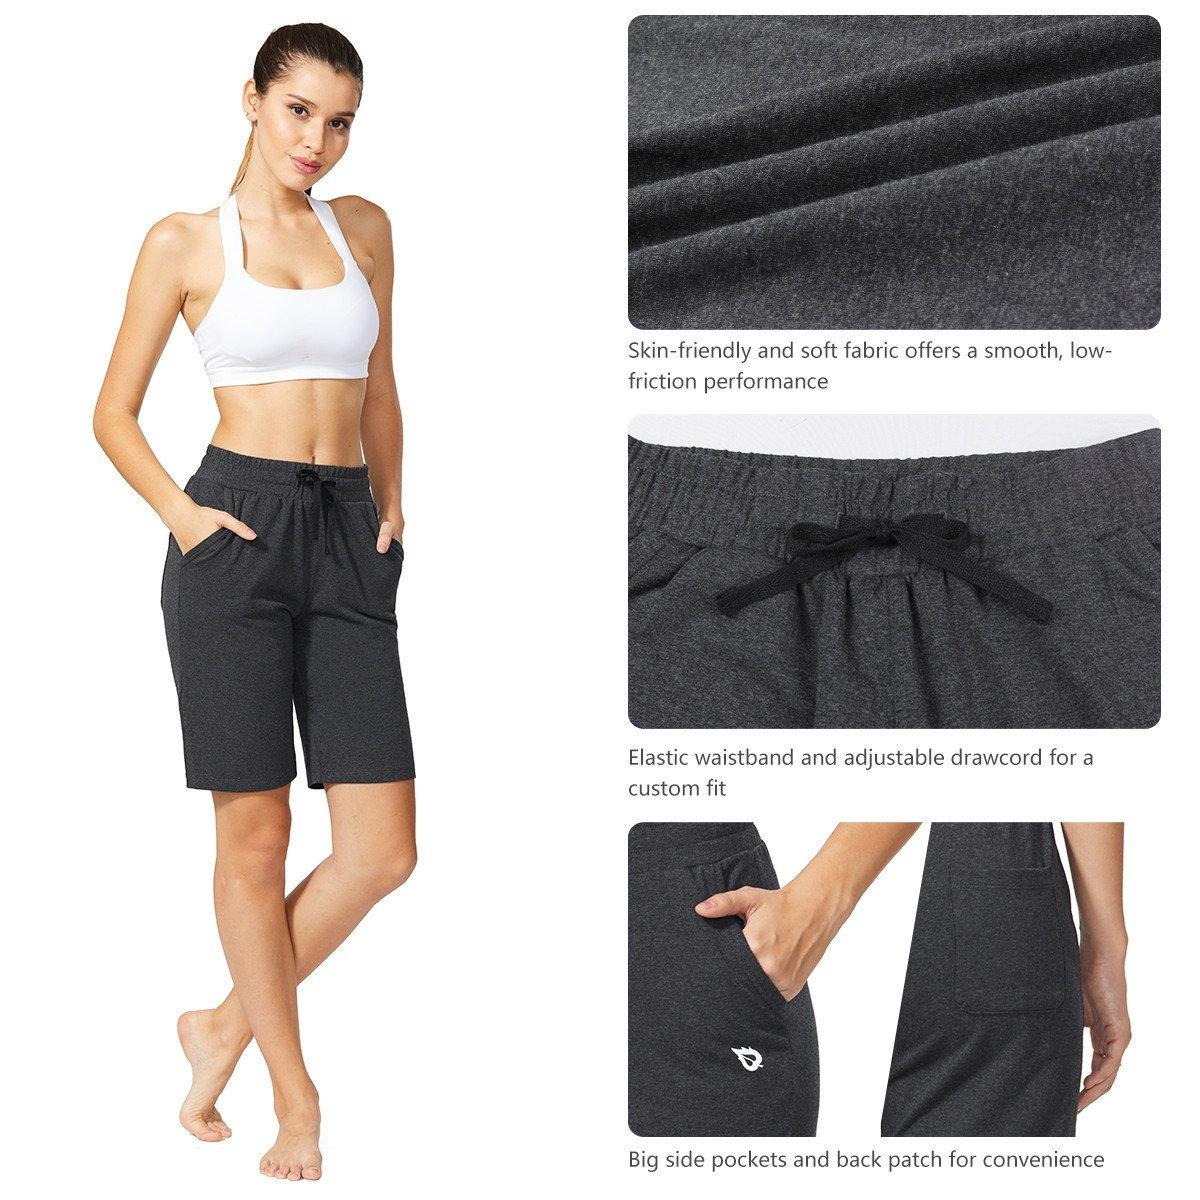 Baleaf Women's Active Yoga Lounge Bermuda Shorts with Pockets Charcoal Size L by Baleaf (Image #4)